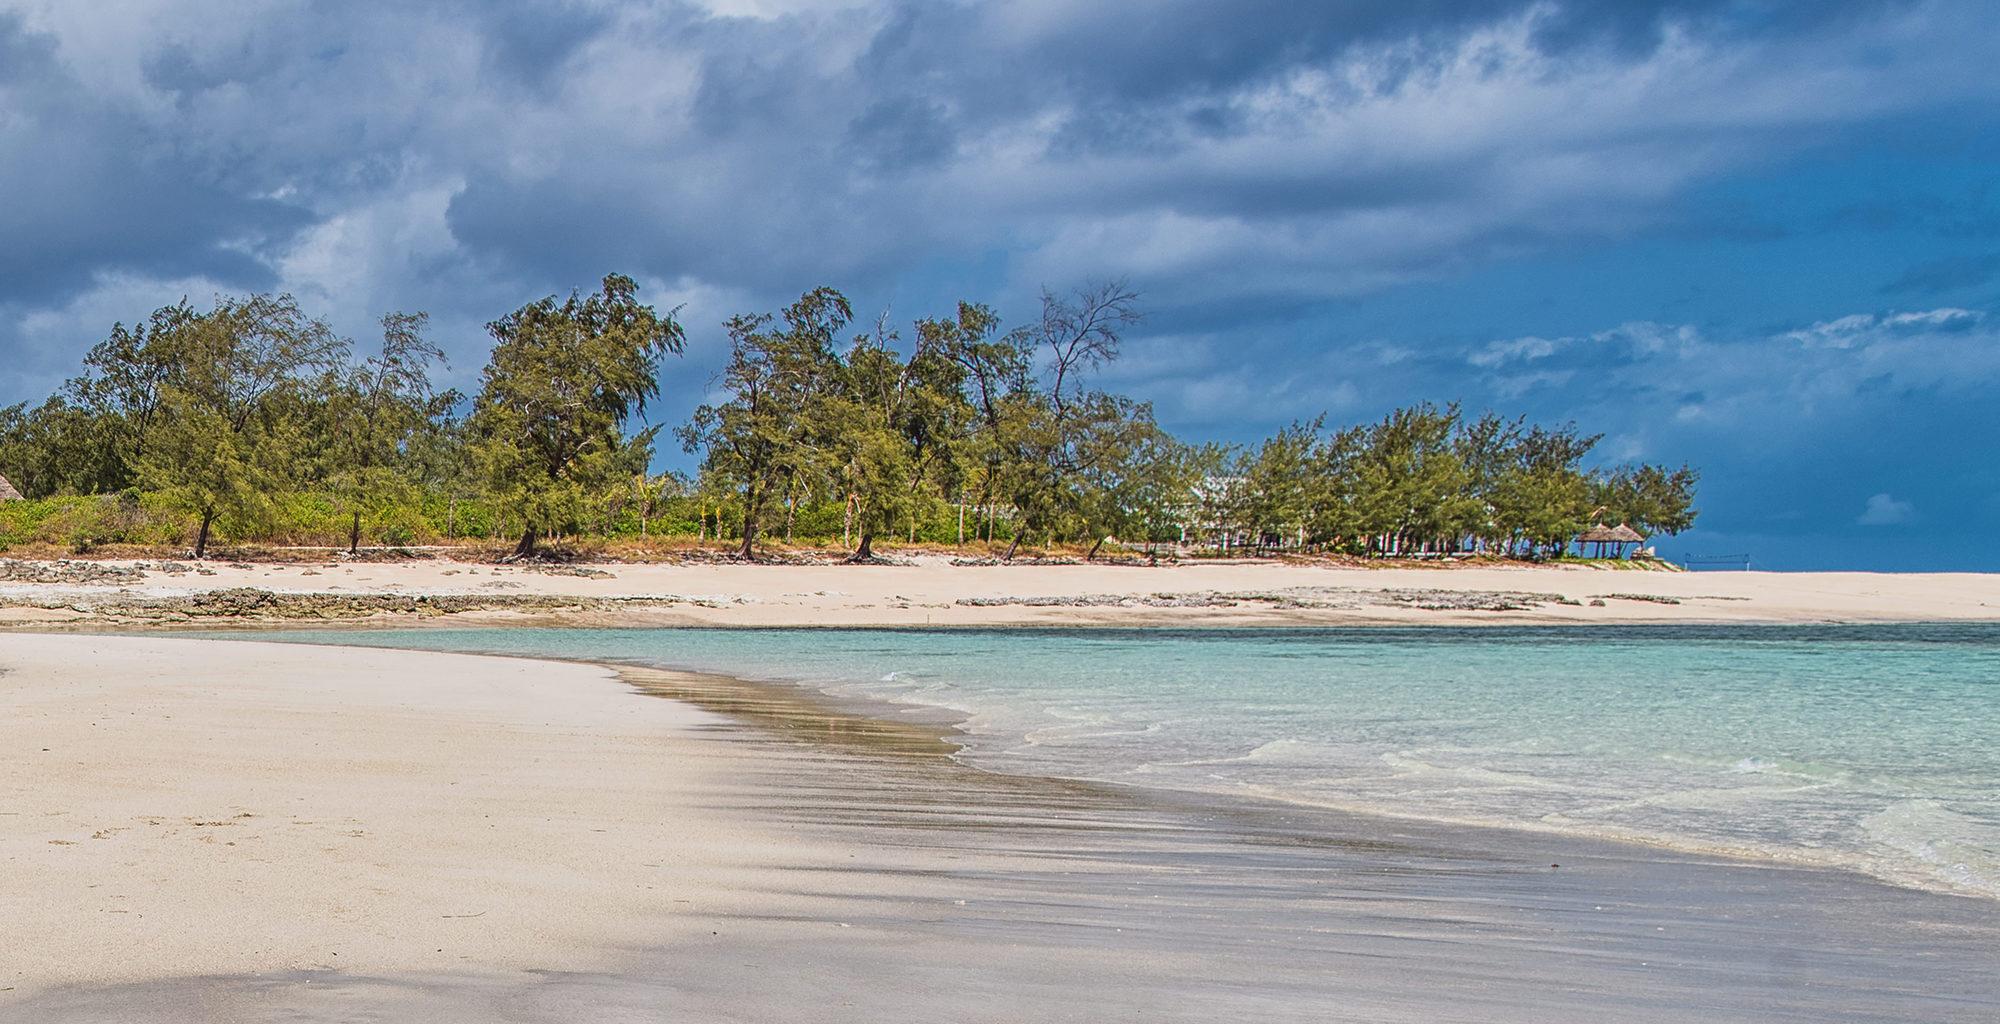 Tanzania-Mainland-Coast-Beach